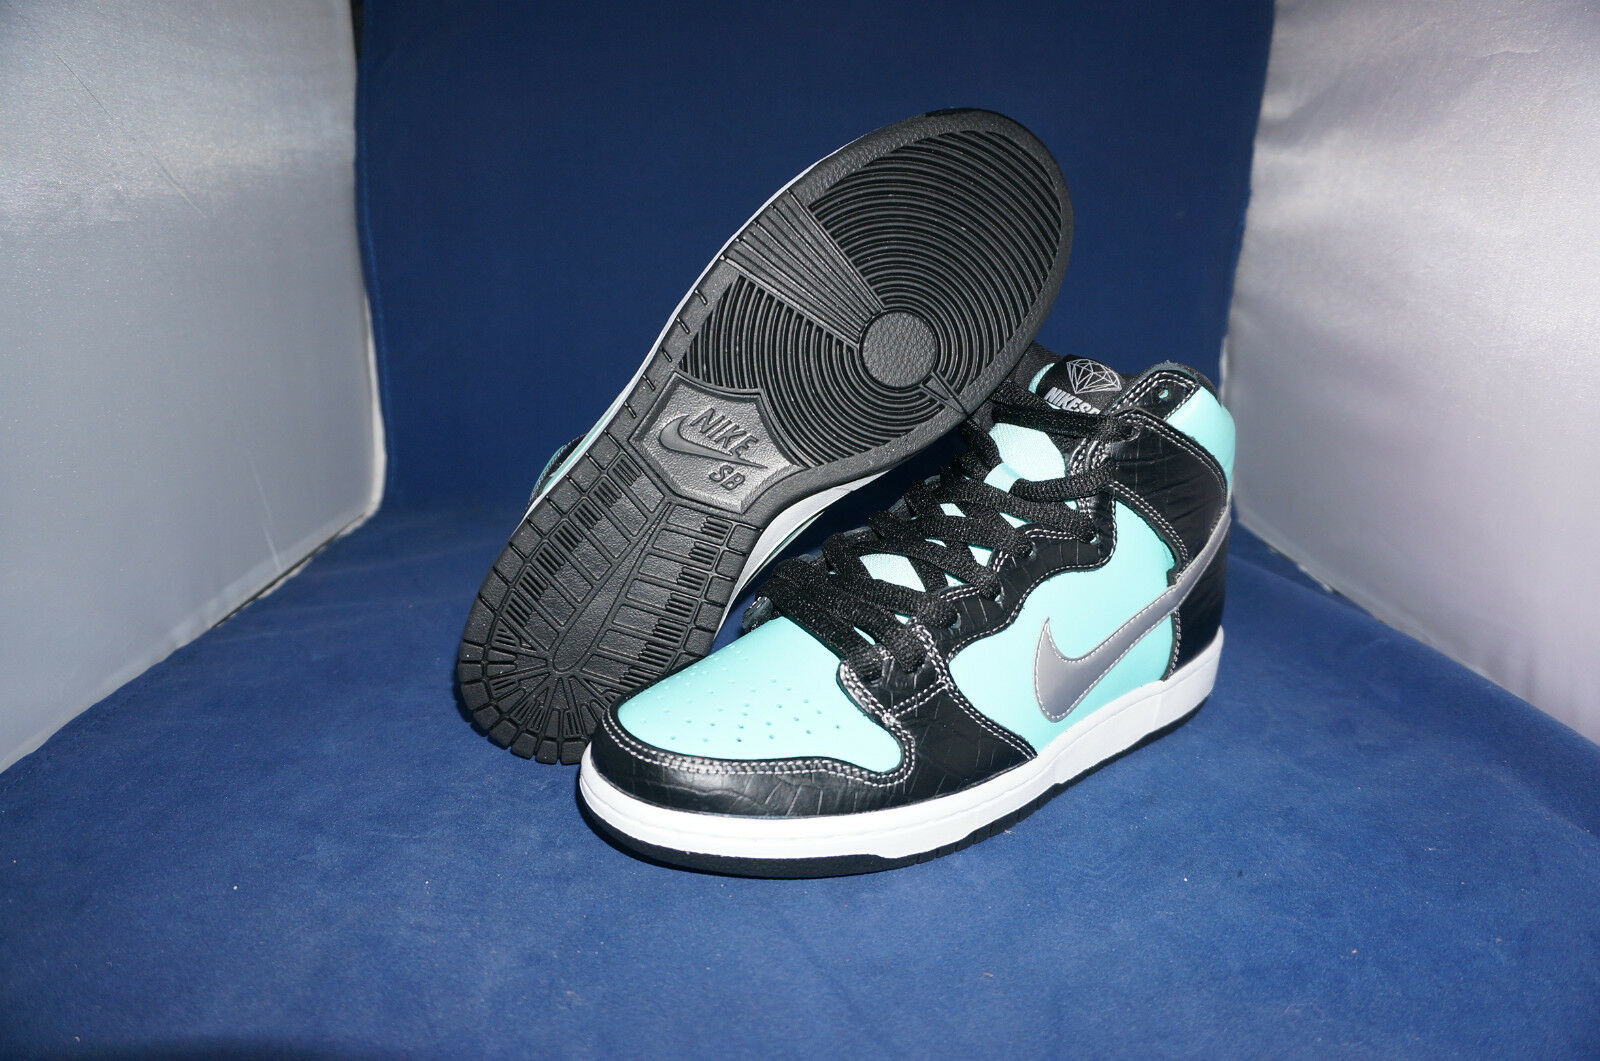 653599 400 Nike SB Dunk High Diamond SZ SZ SZ 12 350ff4